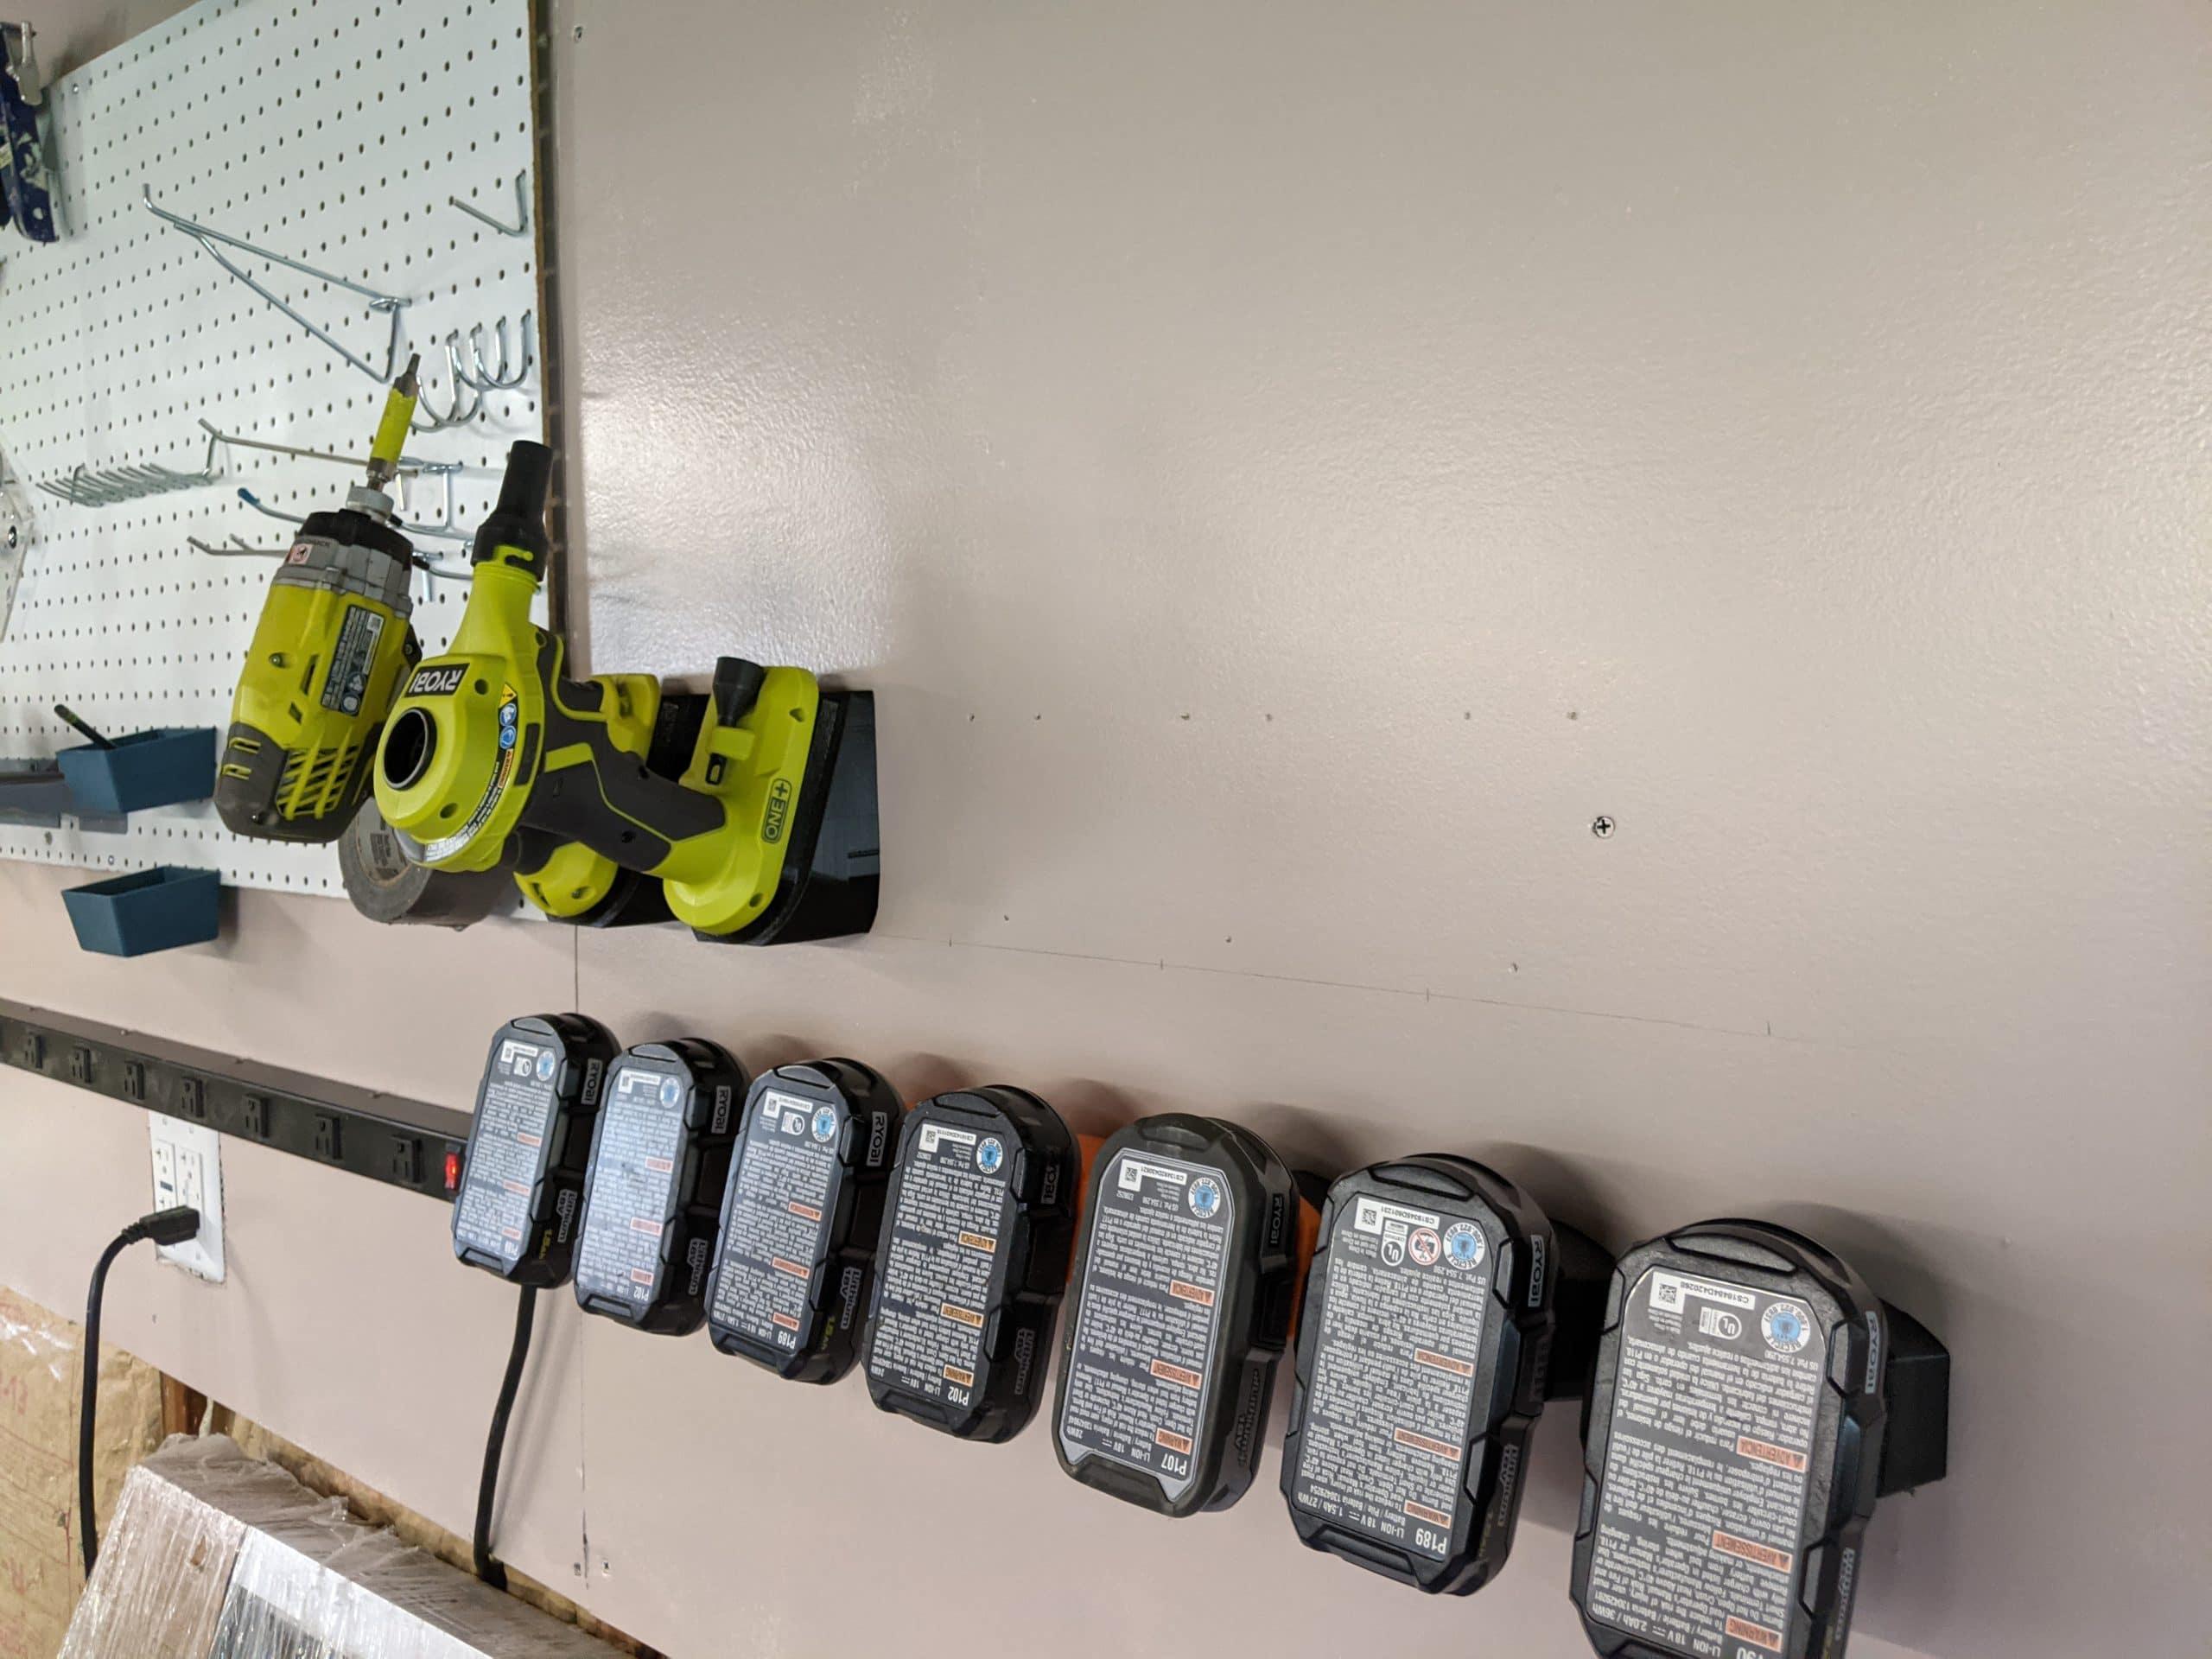 Ryobi batteries and tools mounted on wall